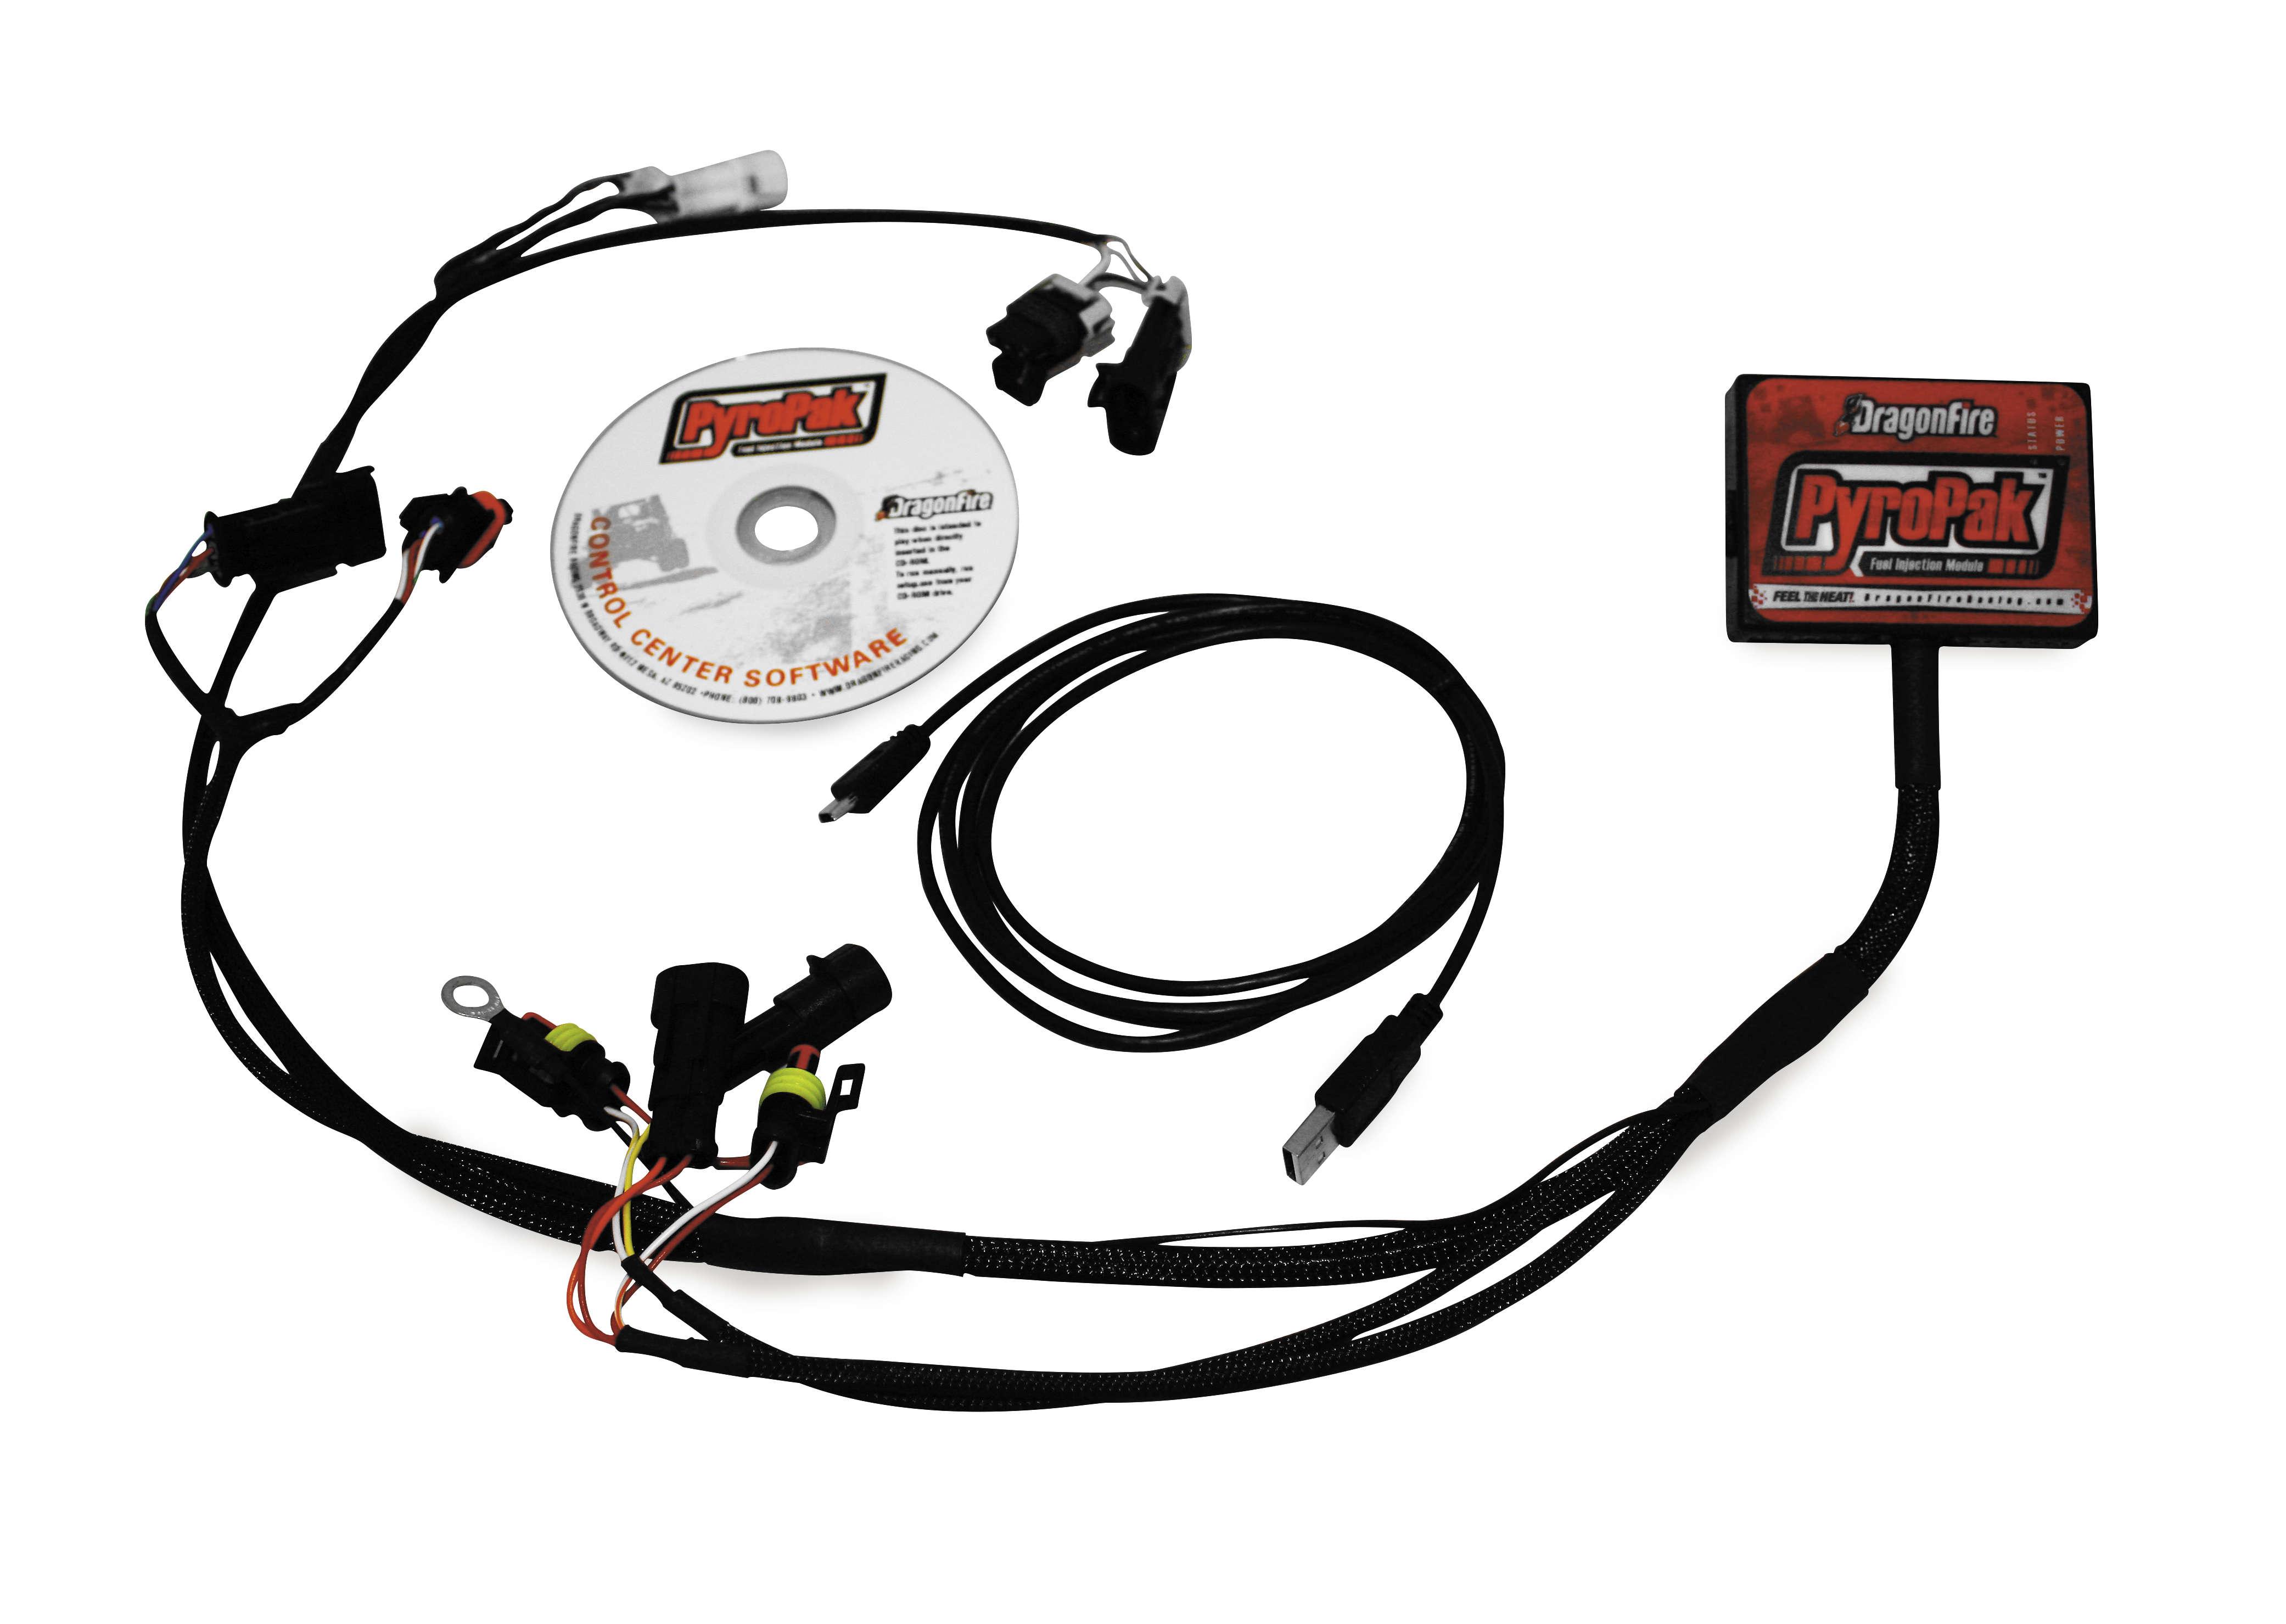 Dragonfire Racing Pyropack Fuel Controller